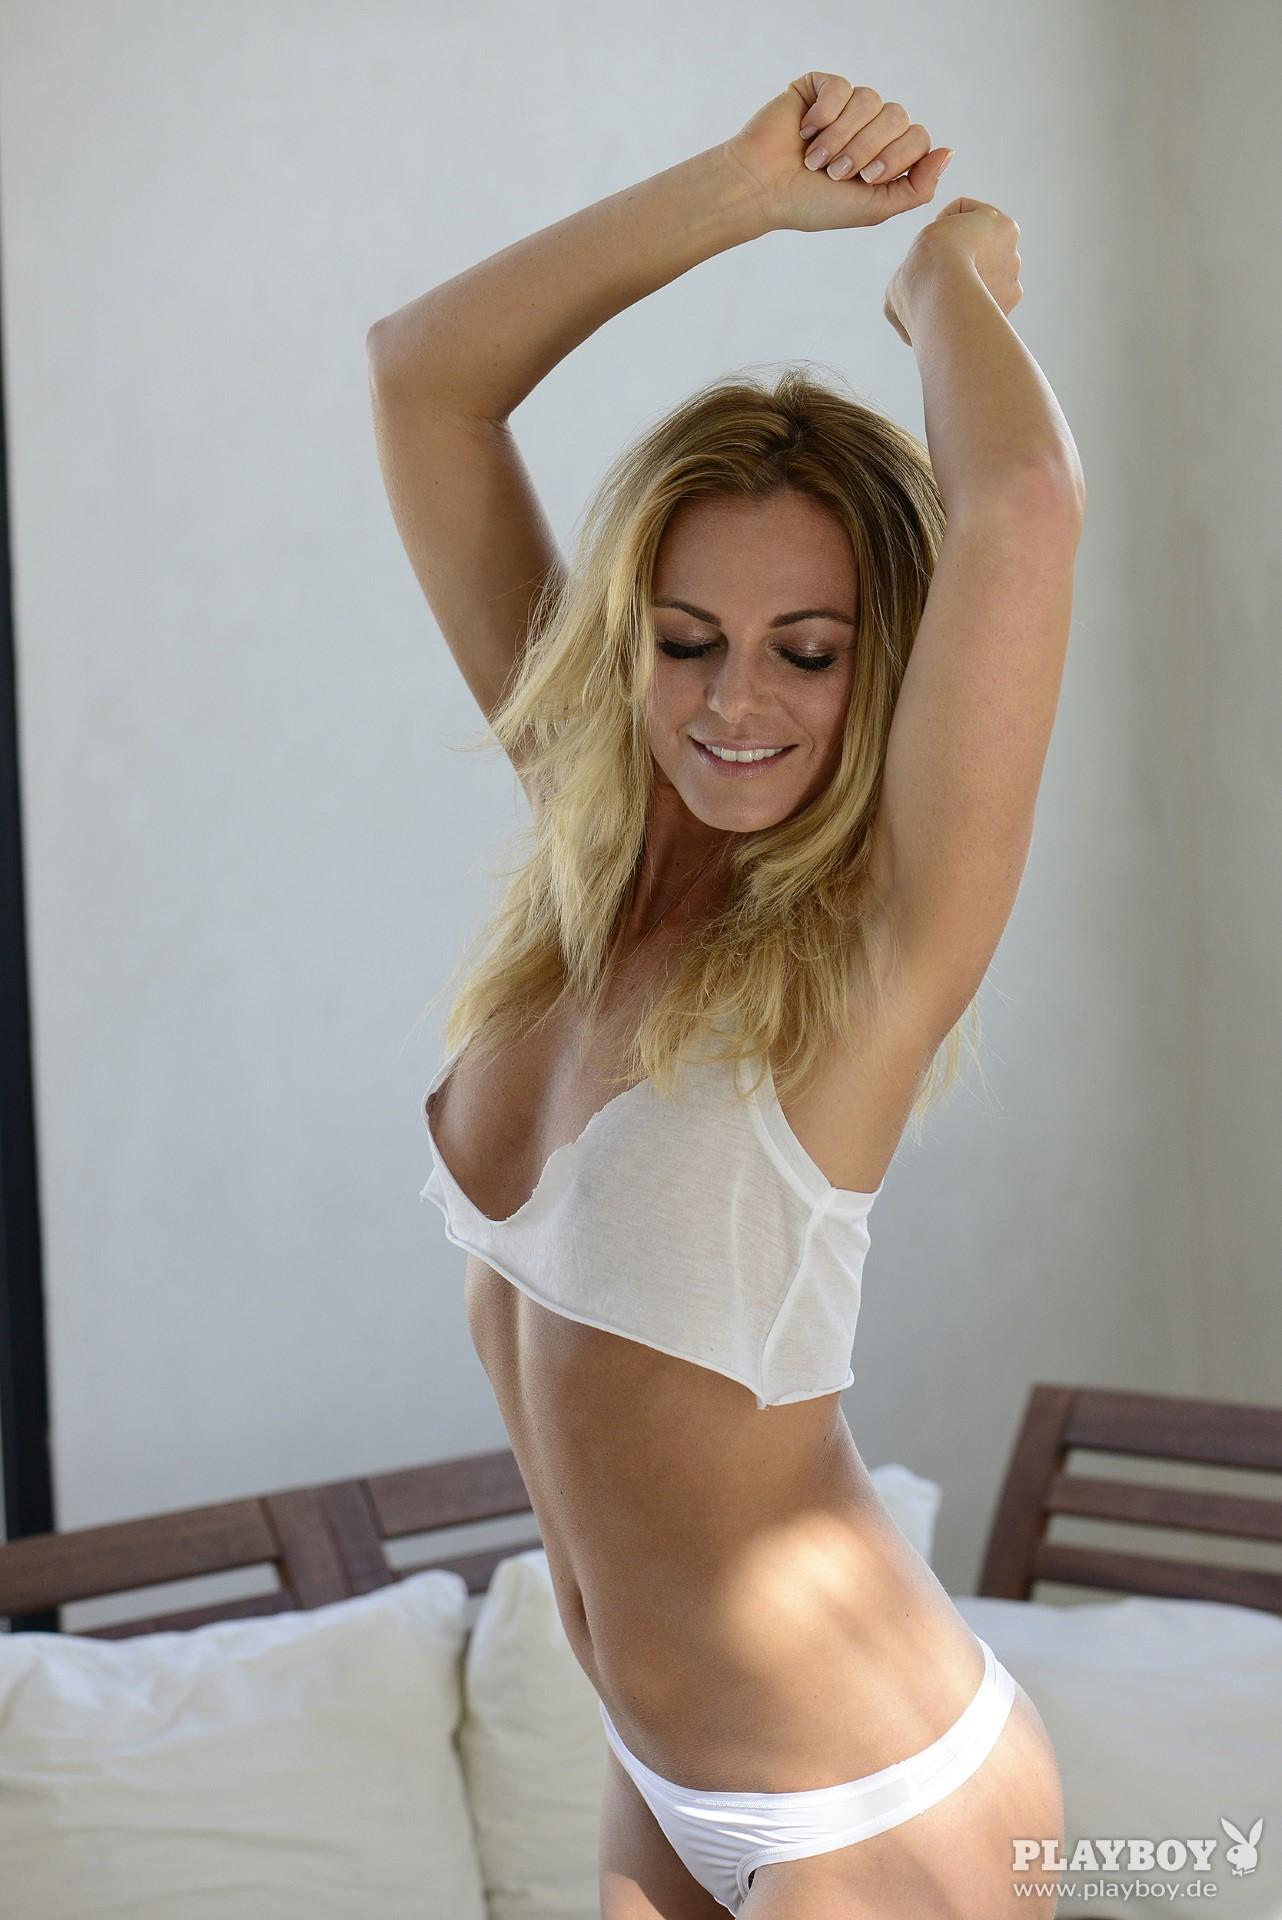 mareike spaleck naked